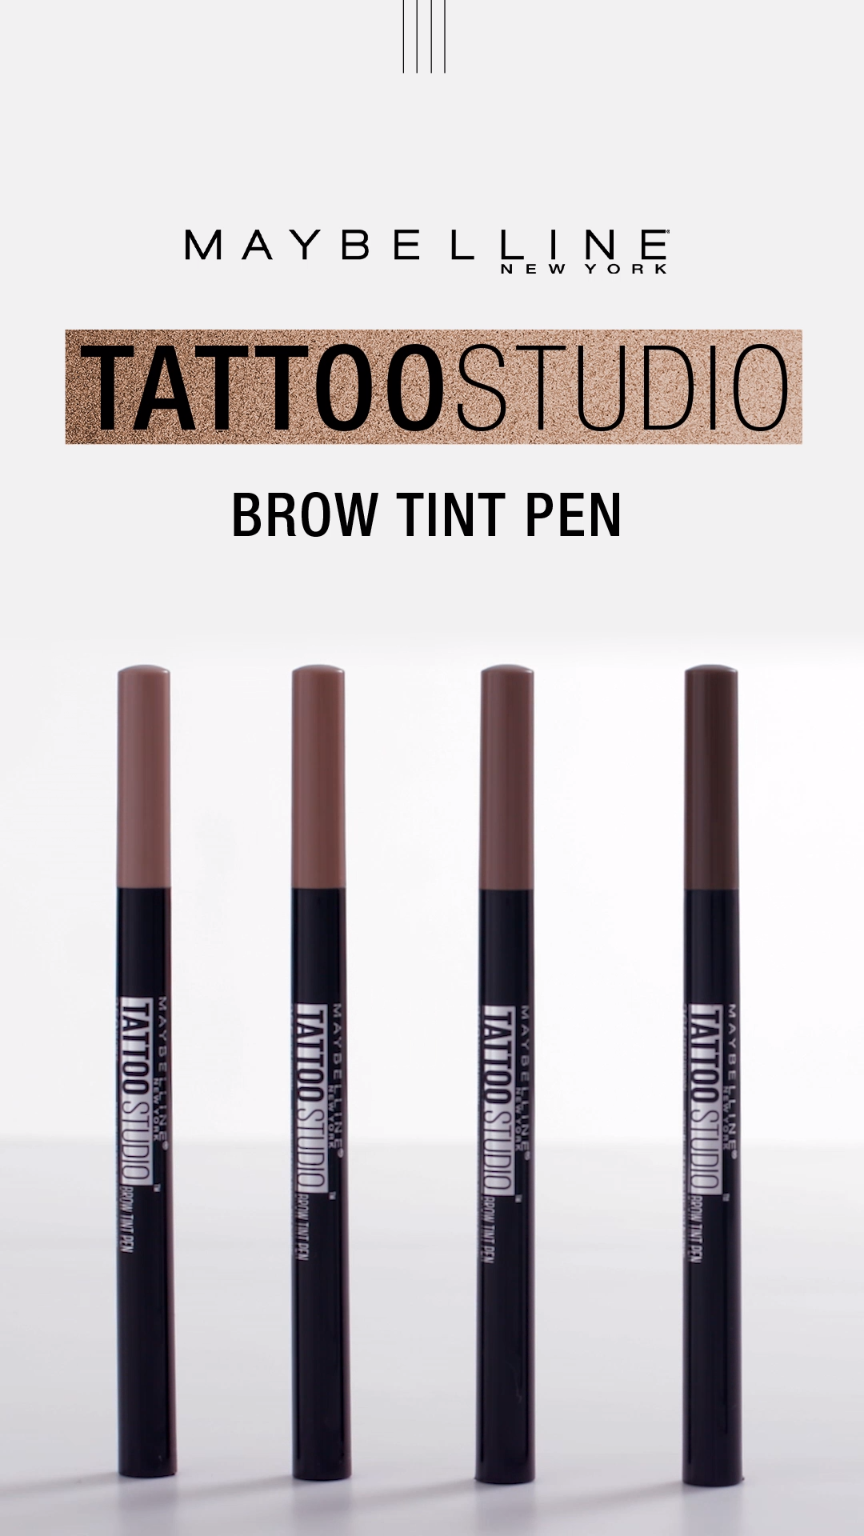 Maybelline TattooStudio Brow Tint Pen Ulta Beauty